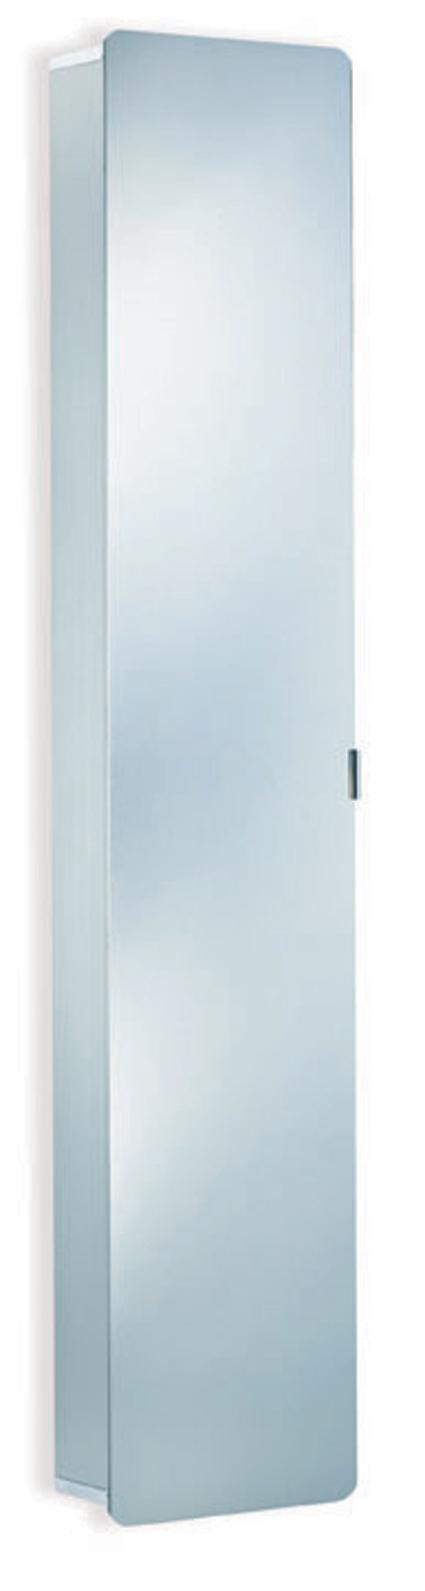 HSK ASP Softcube Alu Spiegelkast hoge kast Afmetingen B 35 x H 175 x